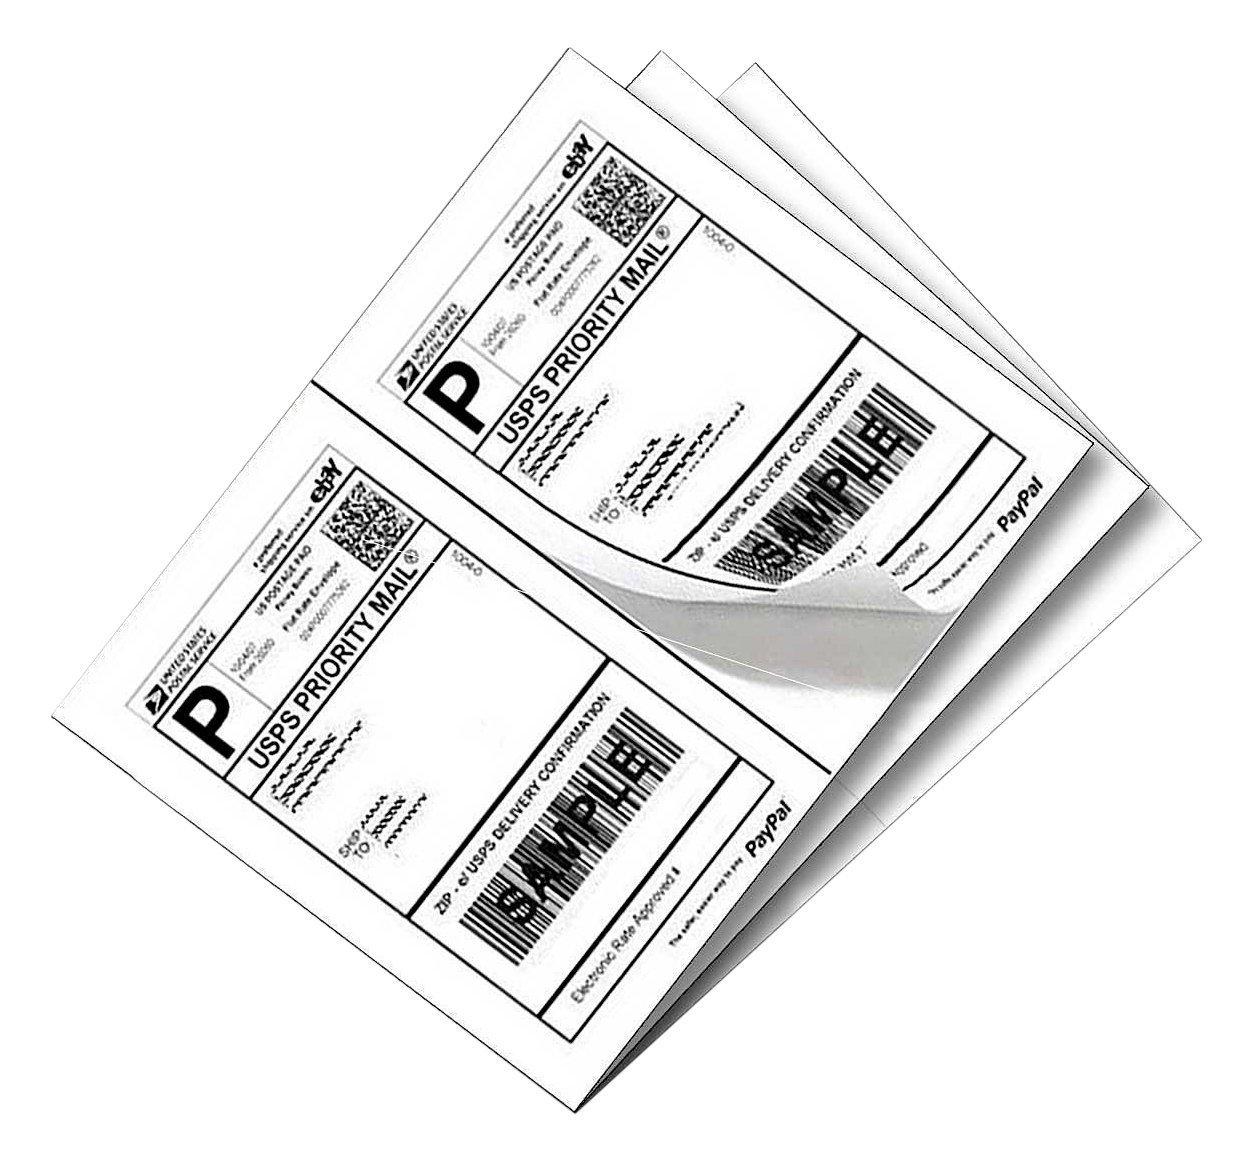 SJPACK 2000 8.5x5.5 Half Sheet Laser/Ink Jet Shipping Labels Mailing Blank Labels by SJPACK